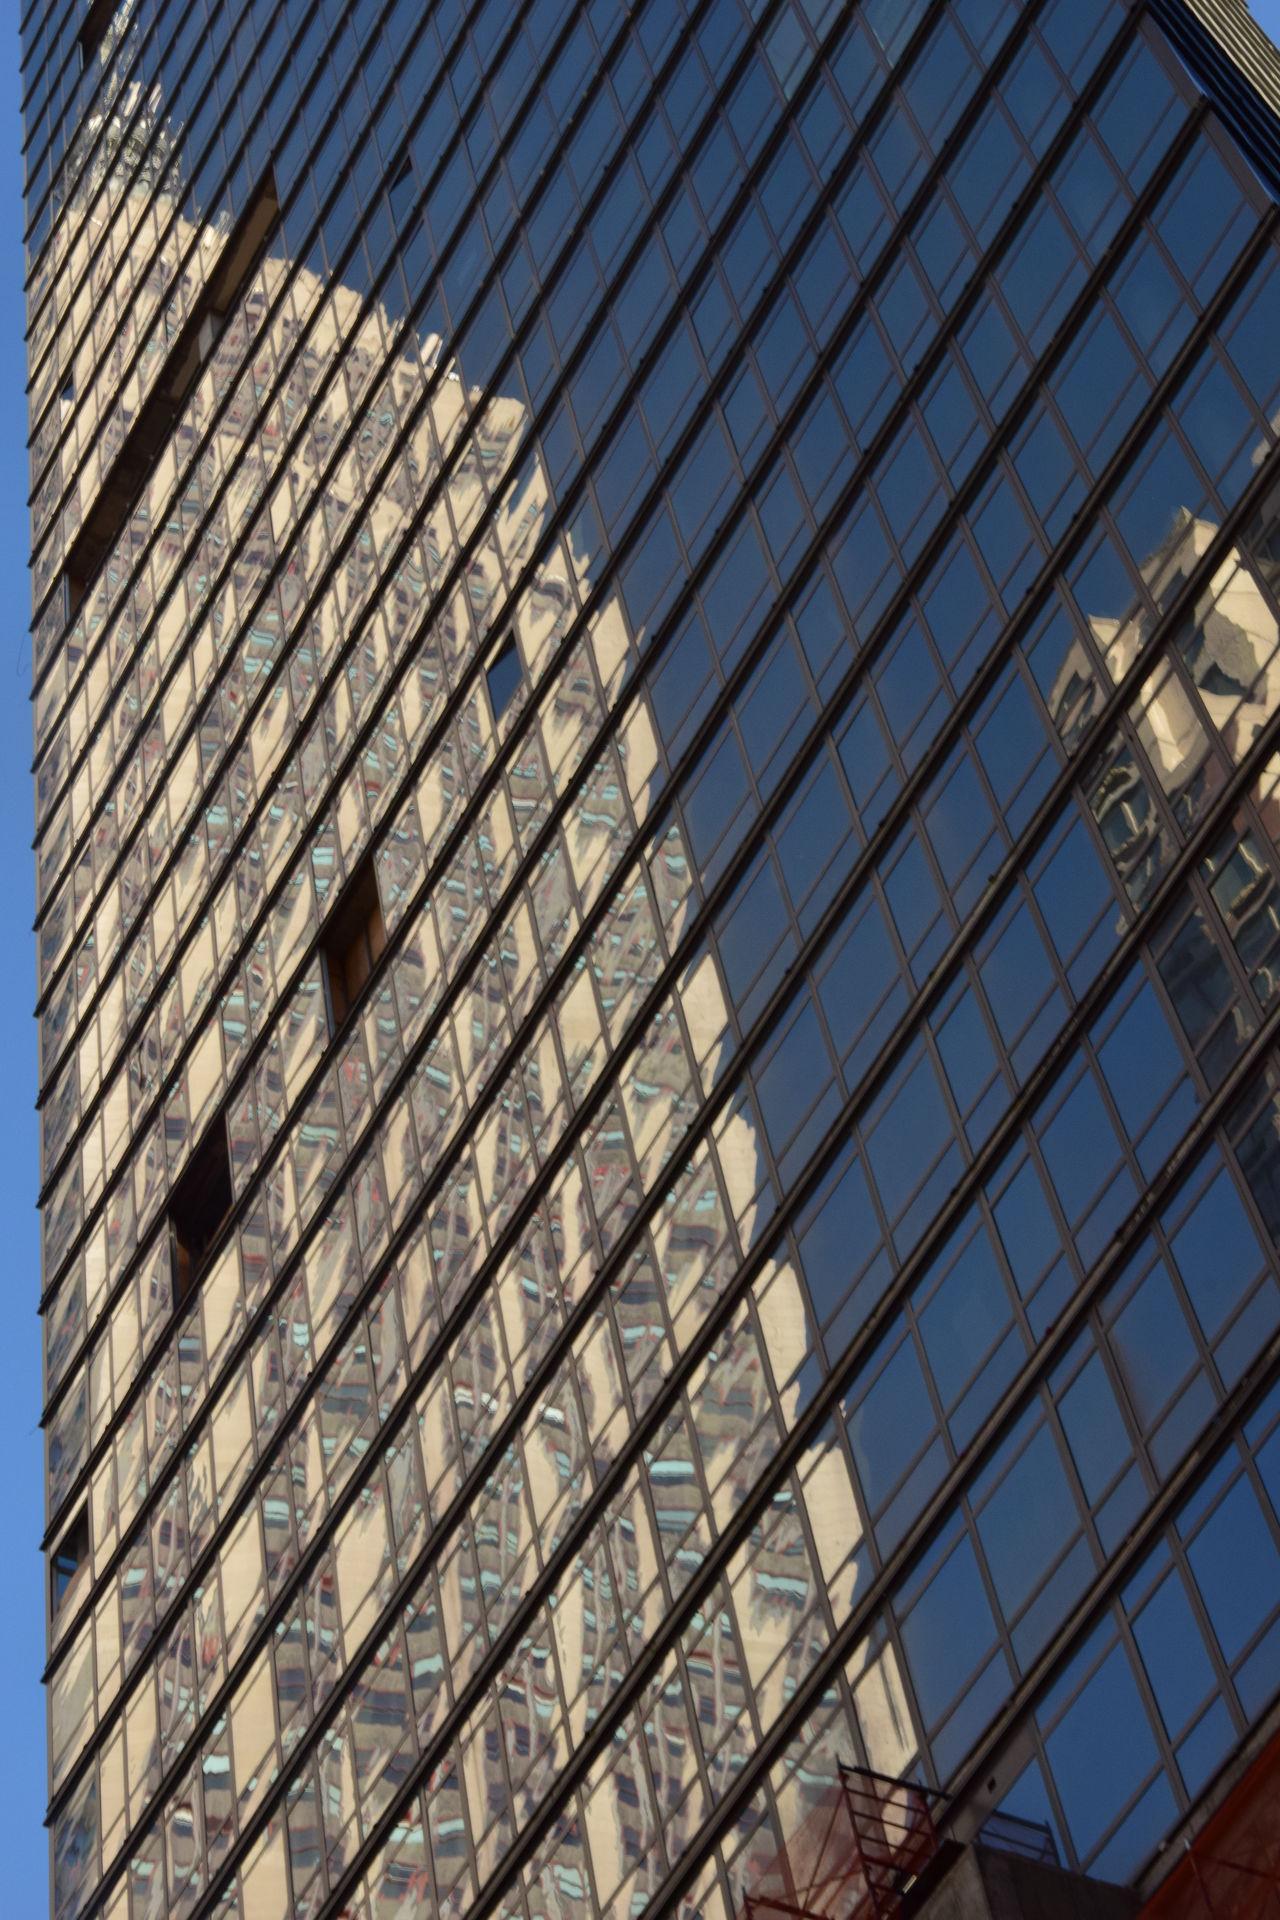 Reflection Architecture Empire State Building New York New York City Reflection Reflection In The Window Scyscraper The Architect - 2017 EyeEm Awards